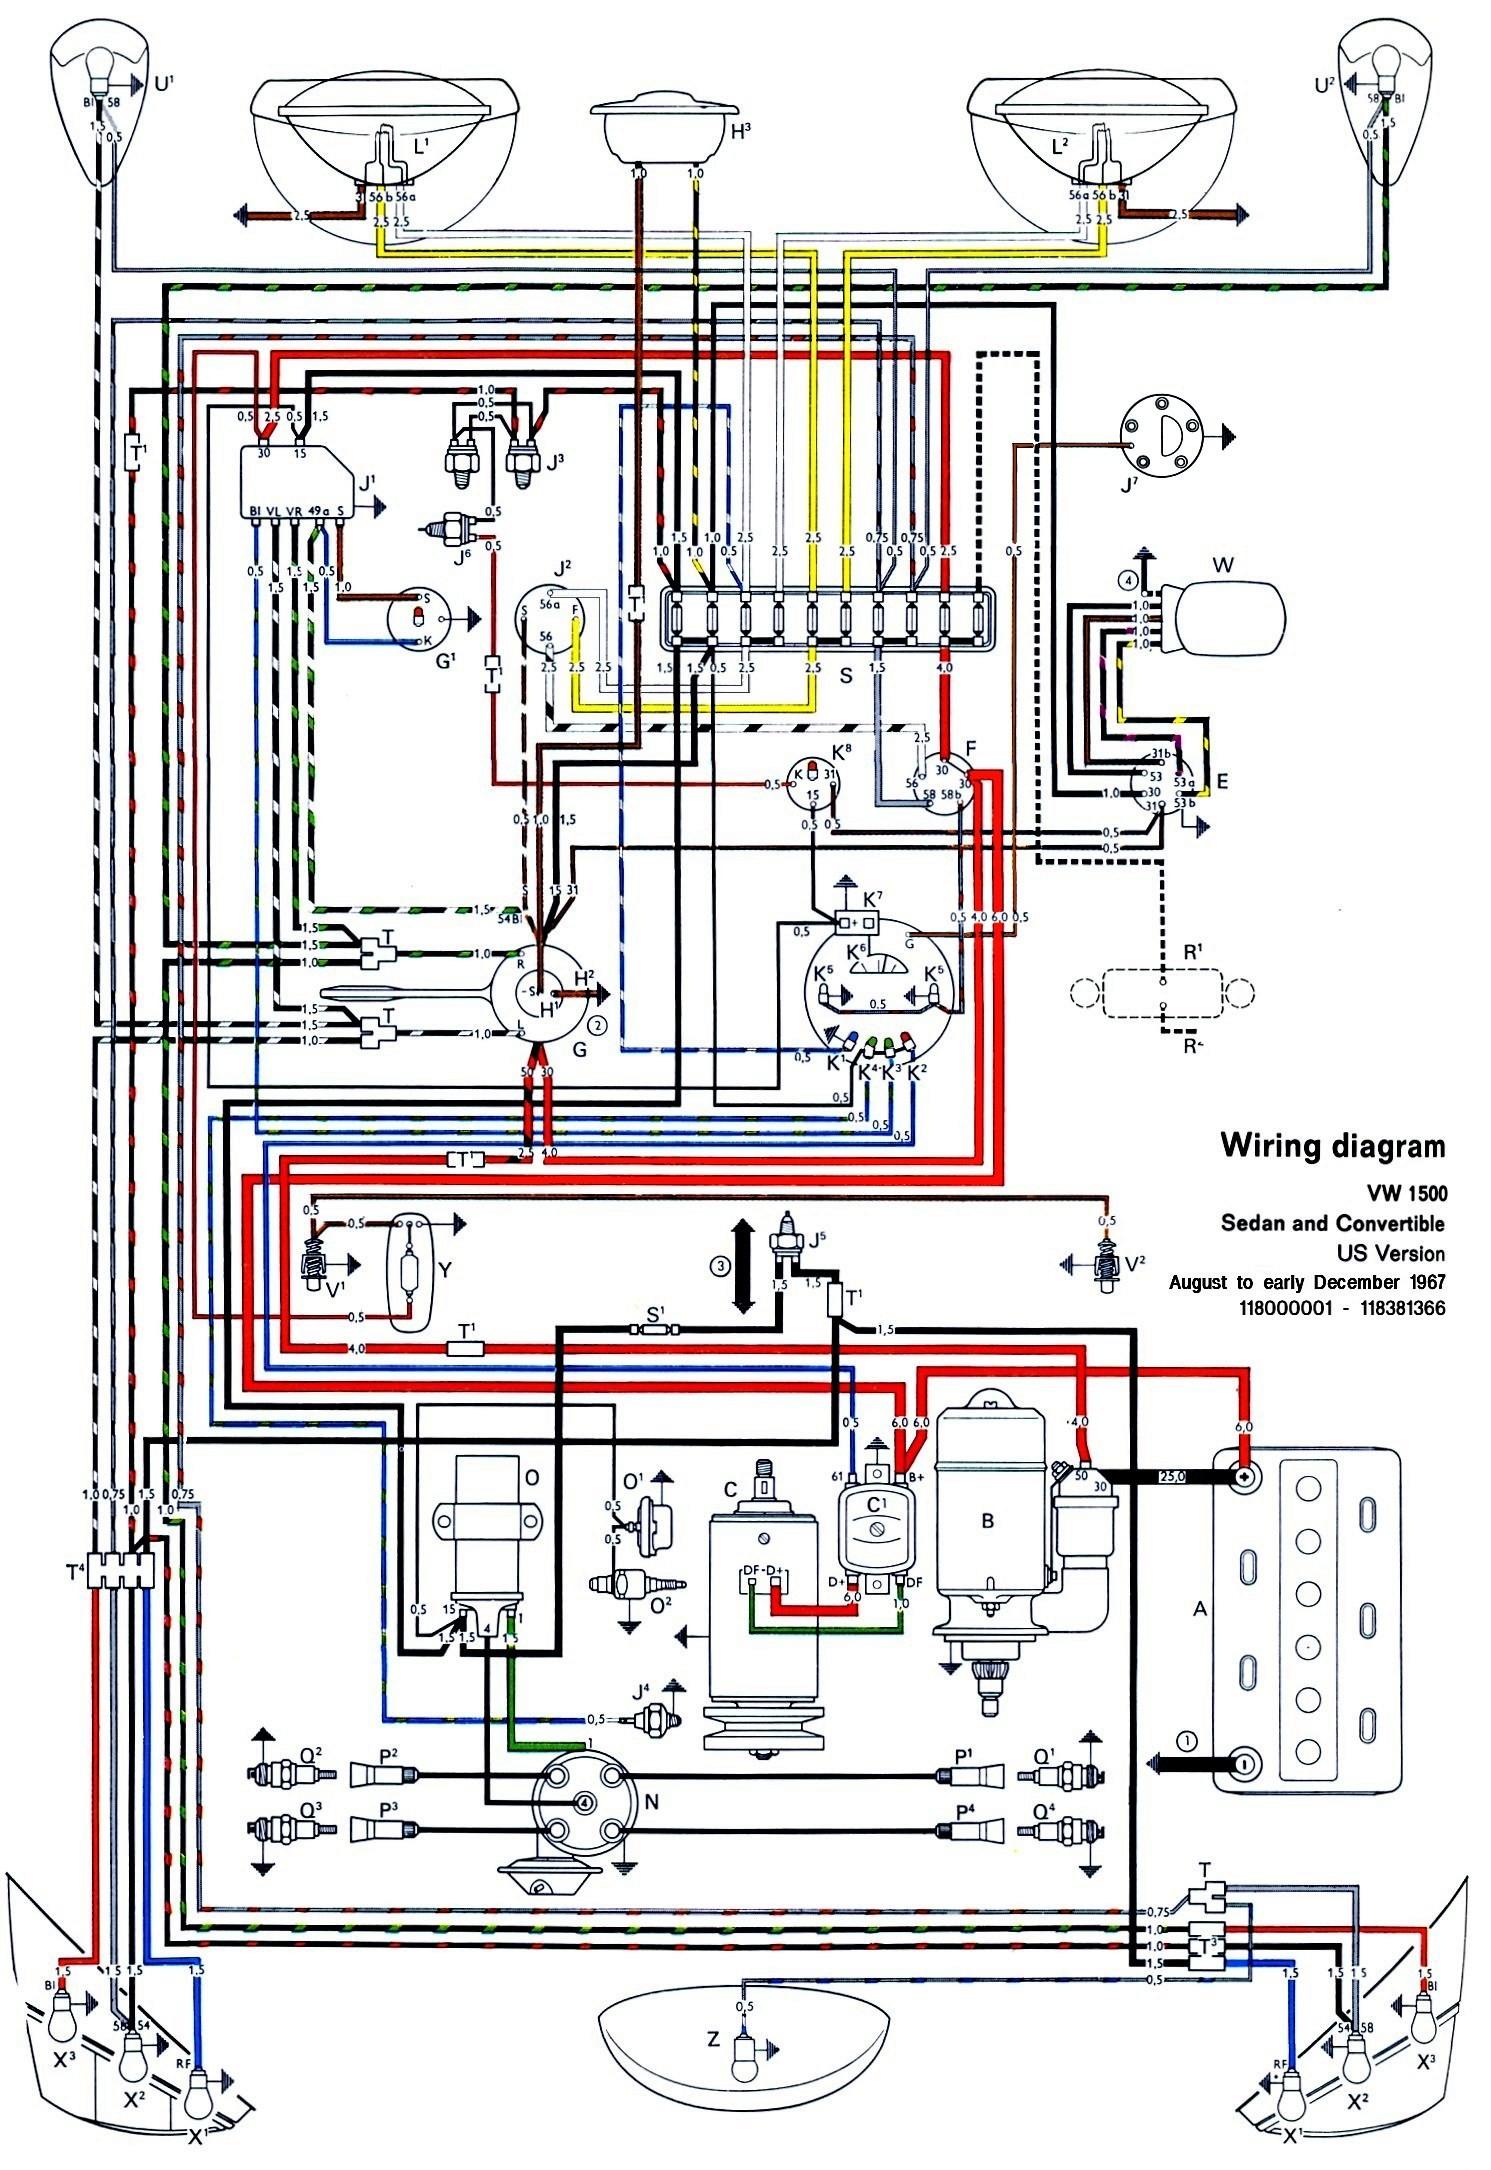 65 vw bug wiring harness just wiring data u2022 rh judgejurden VW Bug plete Wiring 1973 Vw Beetle